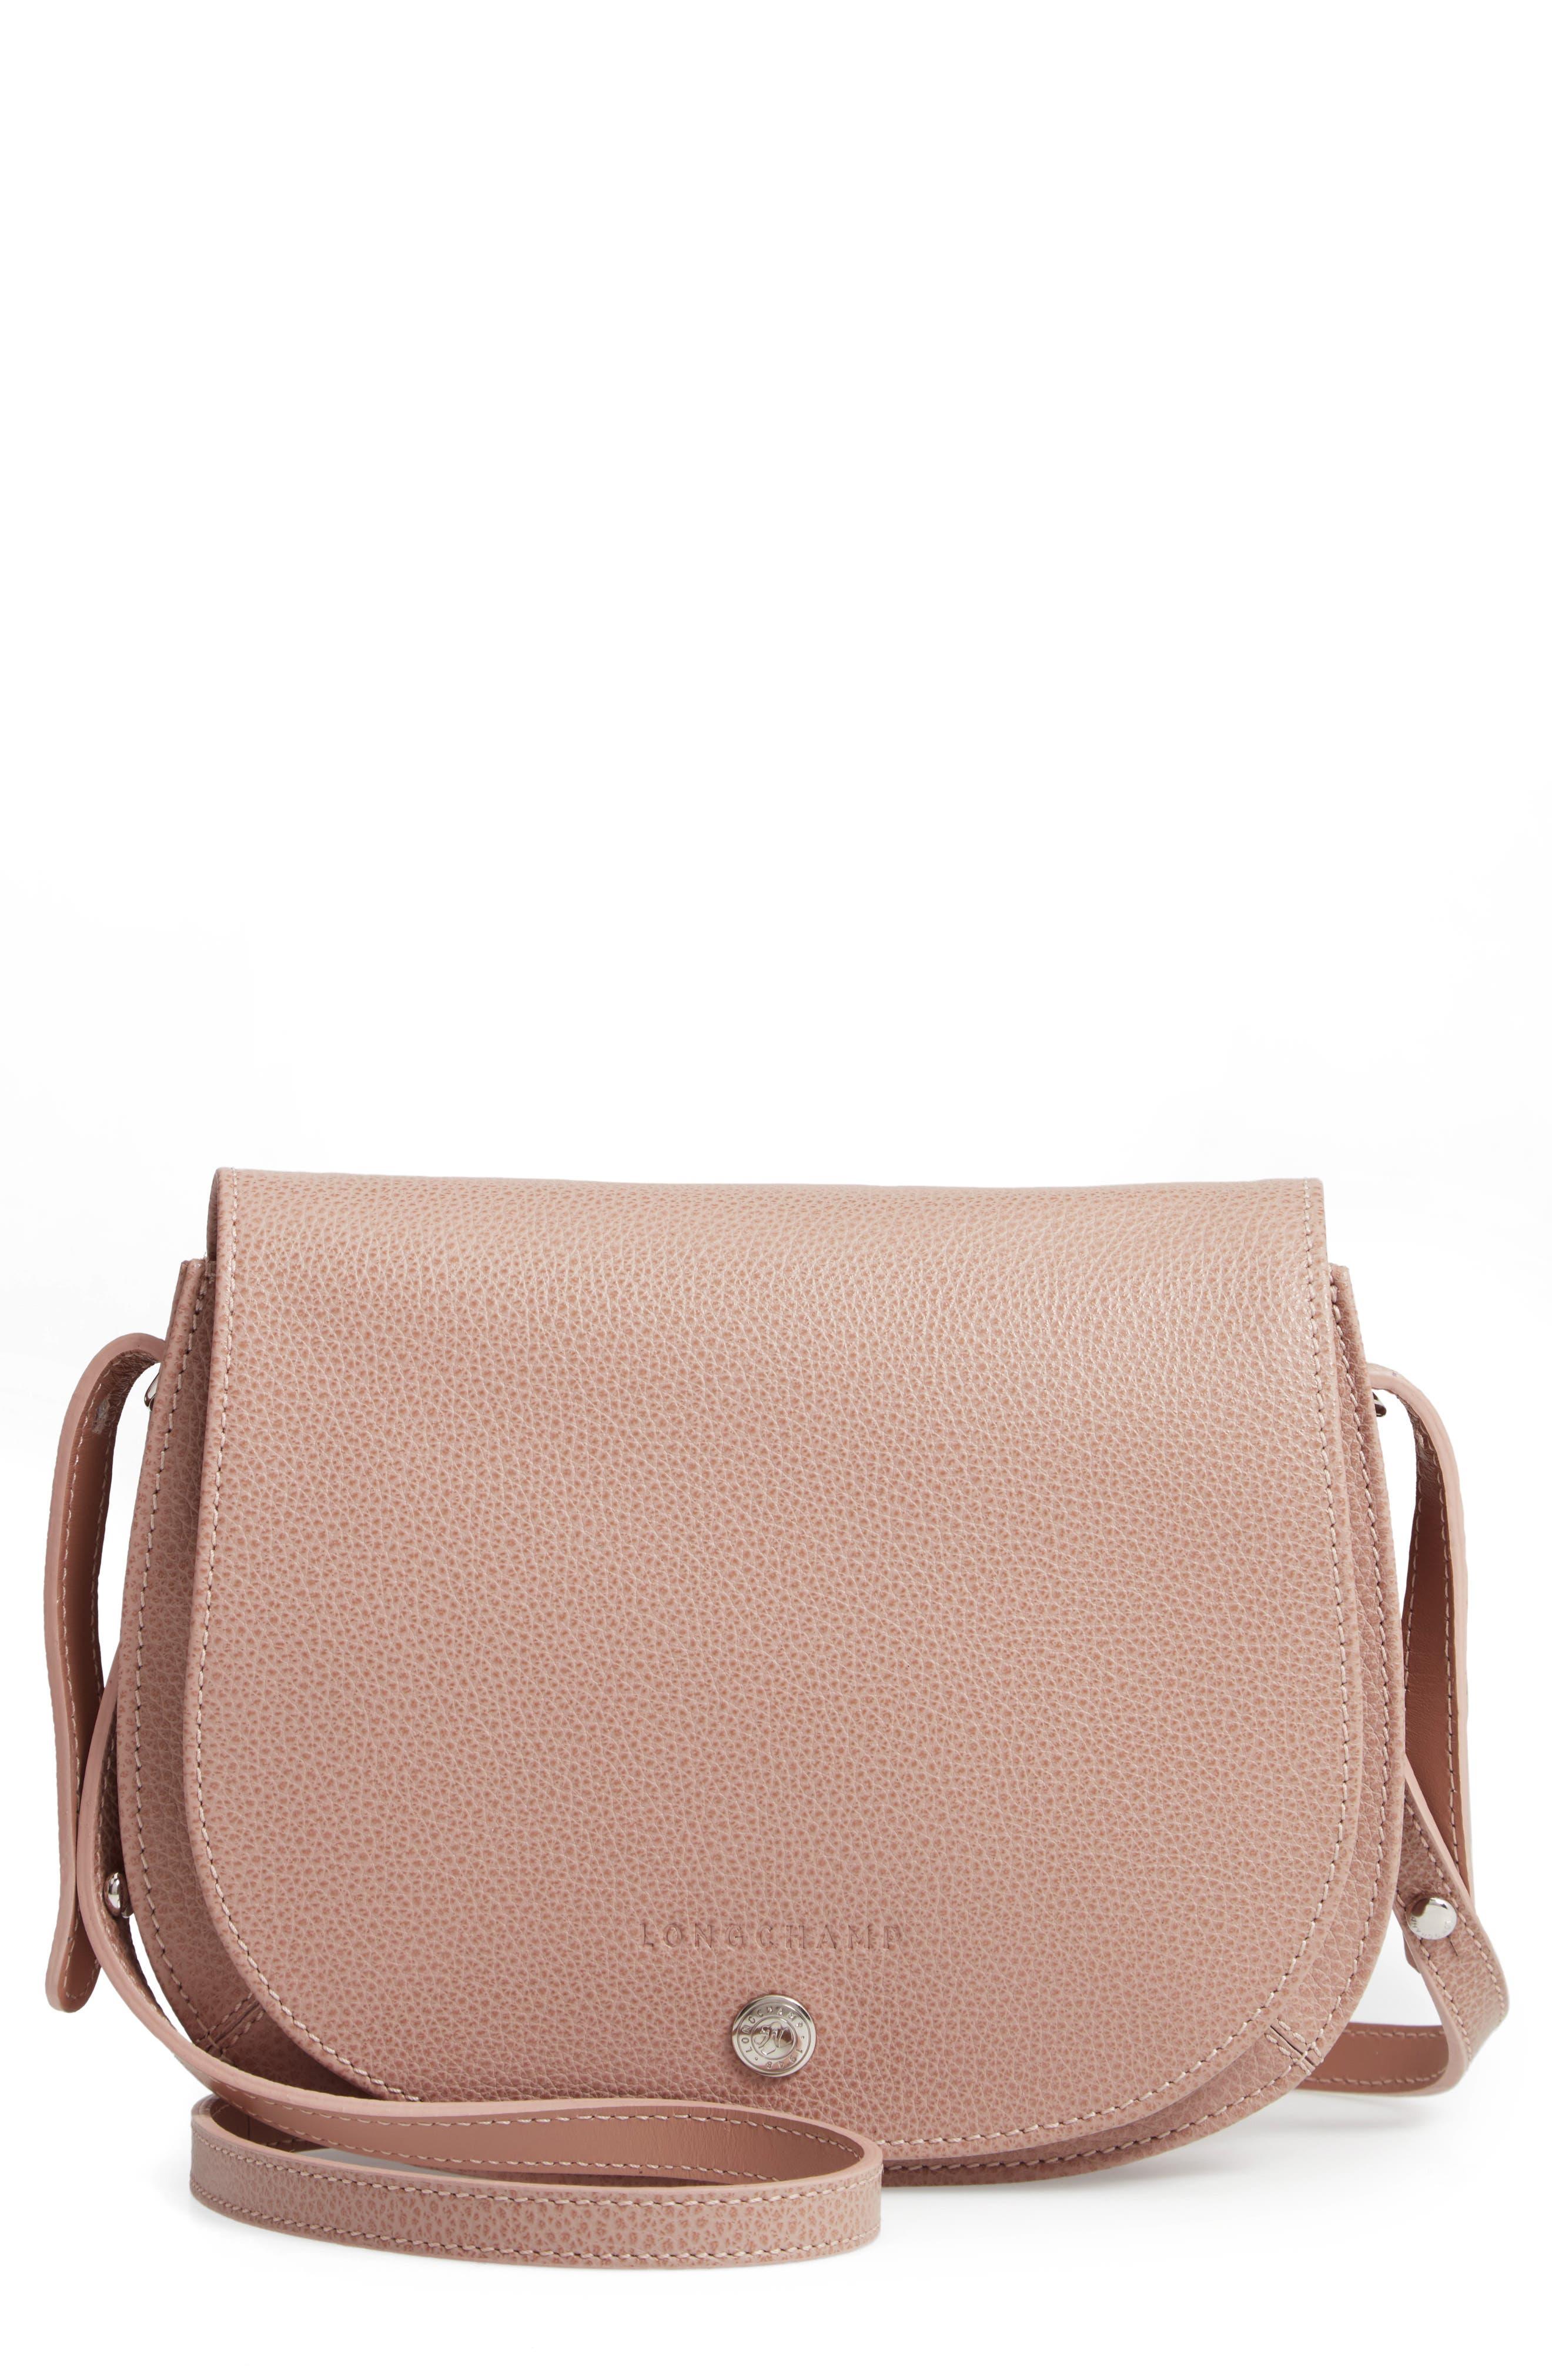 LONGCHAMP Small Le Foulonne Leather Crossbody Bag - Beige in Greige